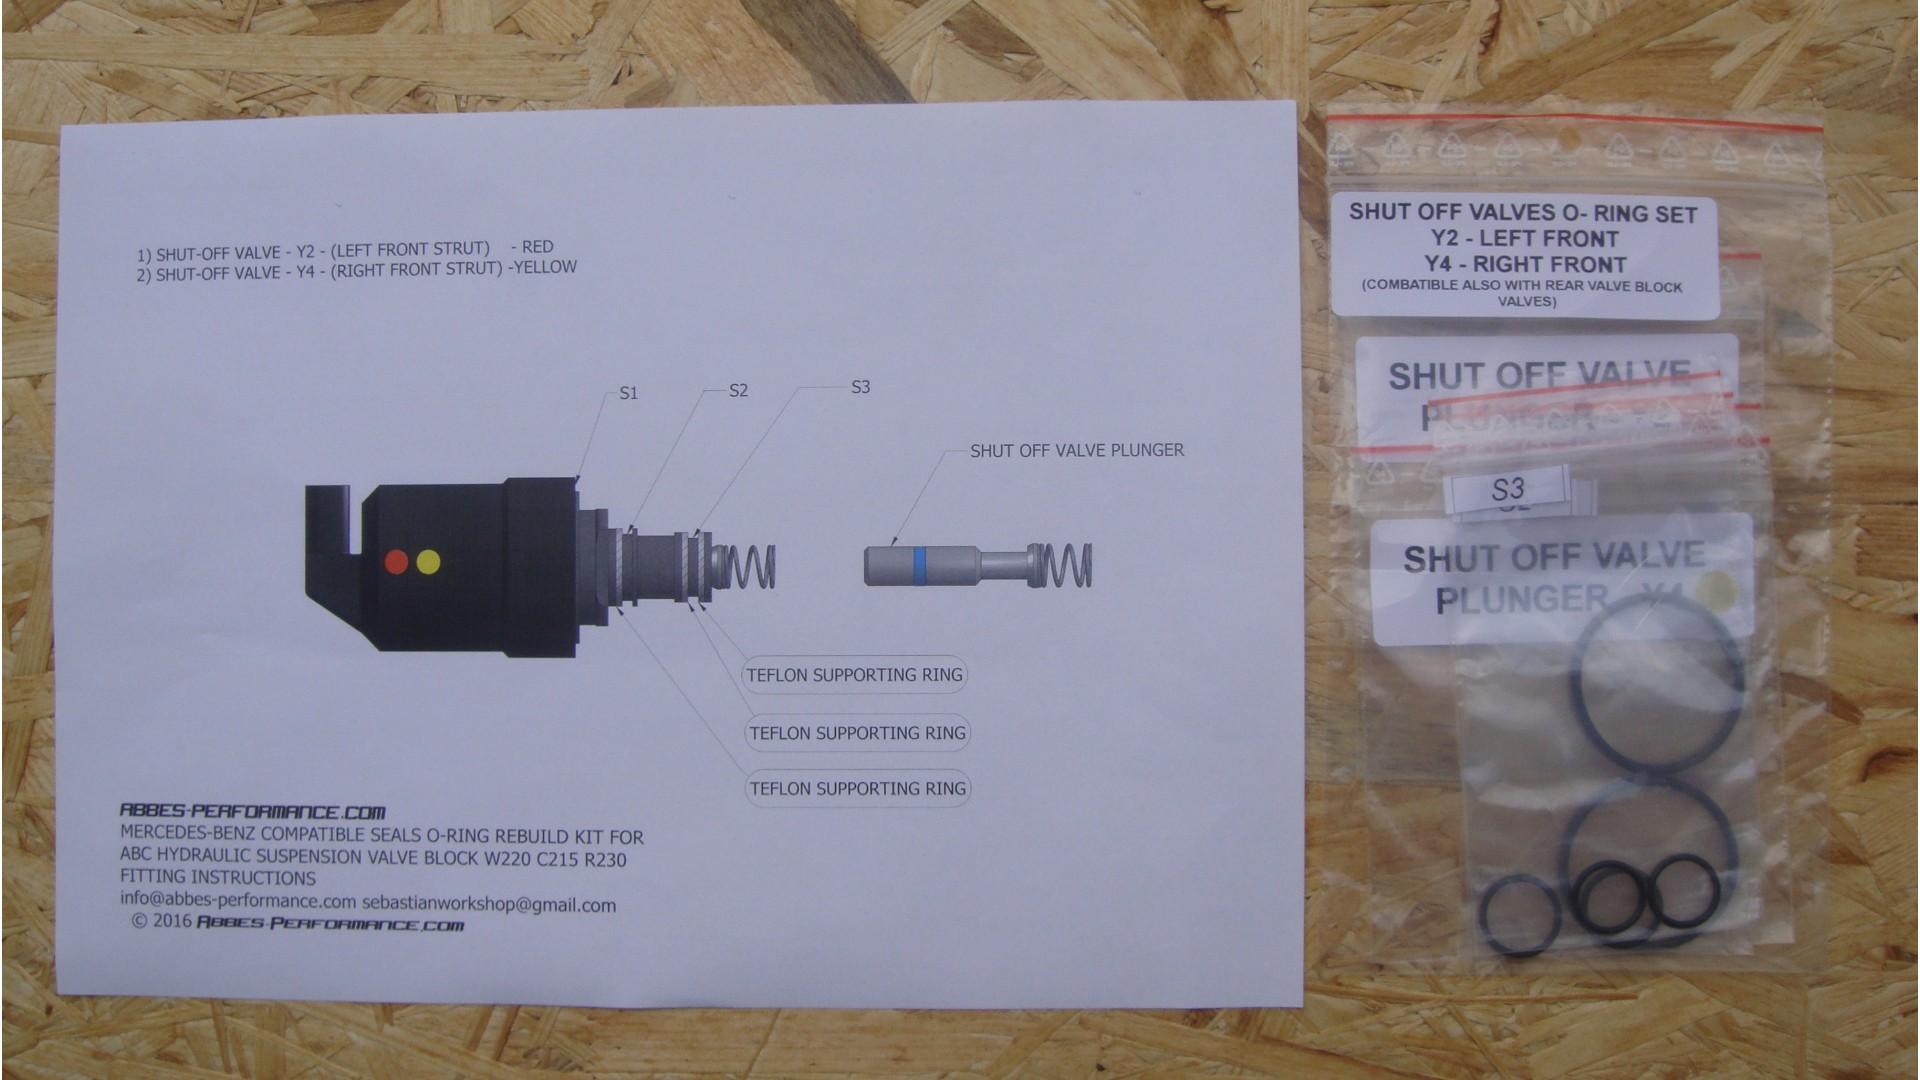 Mercedes-Benz O-ring rebuild kit for ABC valve block W220 C215 R230